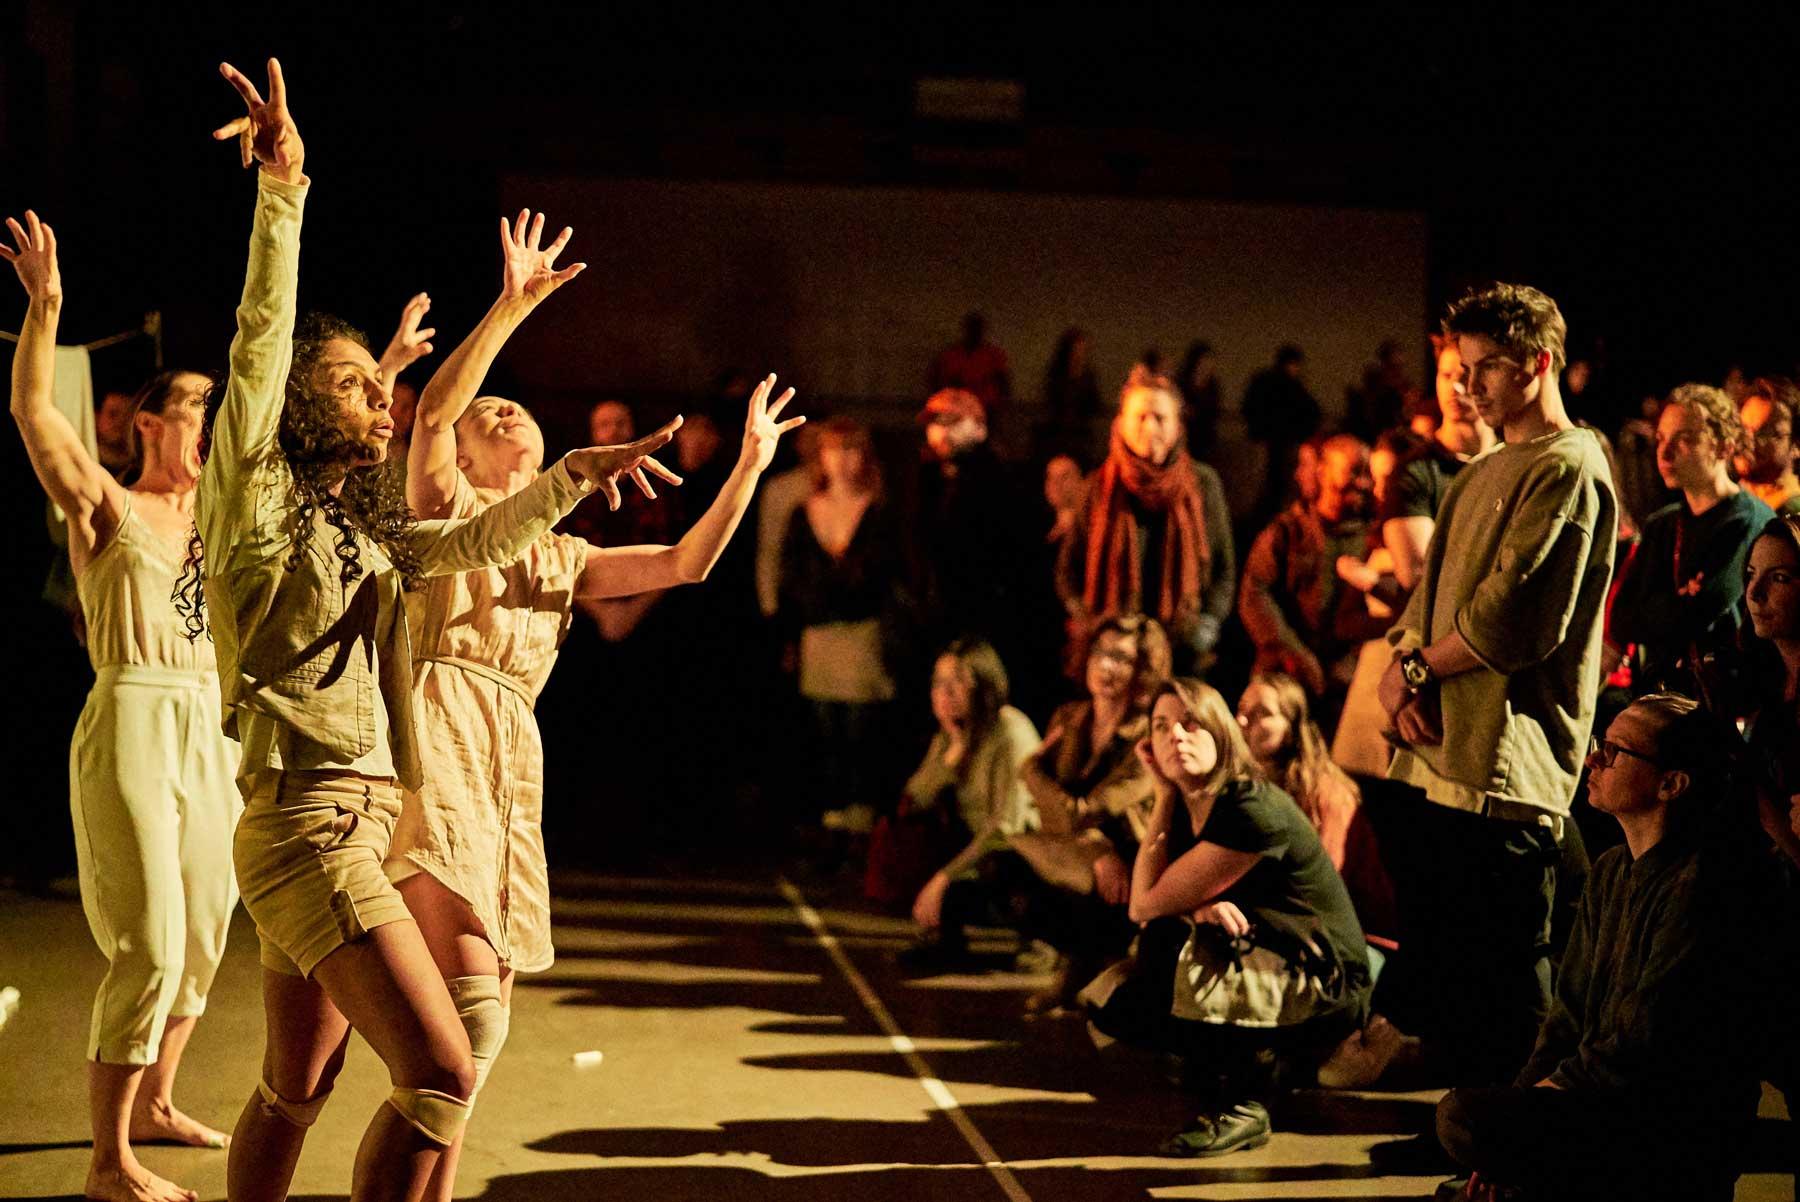 mardi-culturel-td-danse-danse-kyra-jean-green-trip-the-light-fantastic-13.jpg